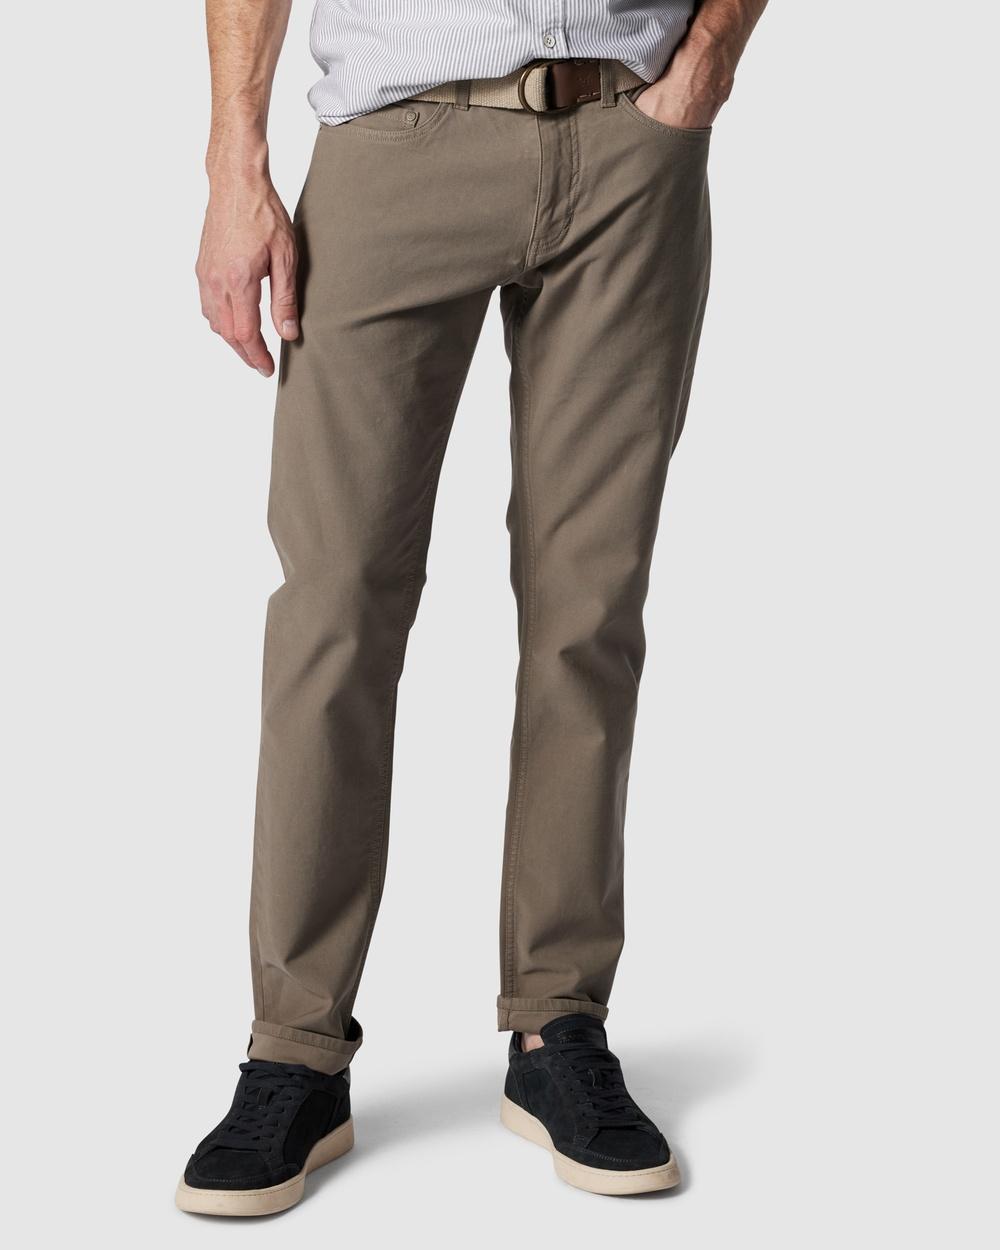 Rodd & Gunn Motion 2 Straight Jeans R Pebble Australia